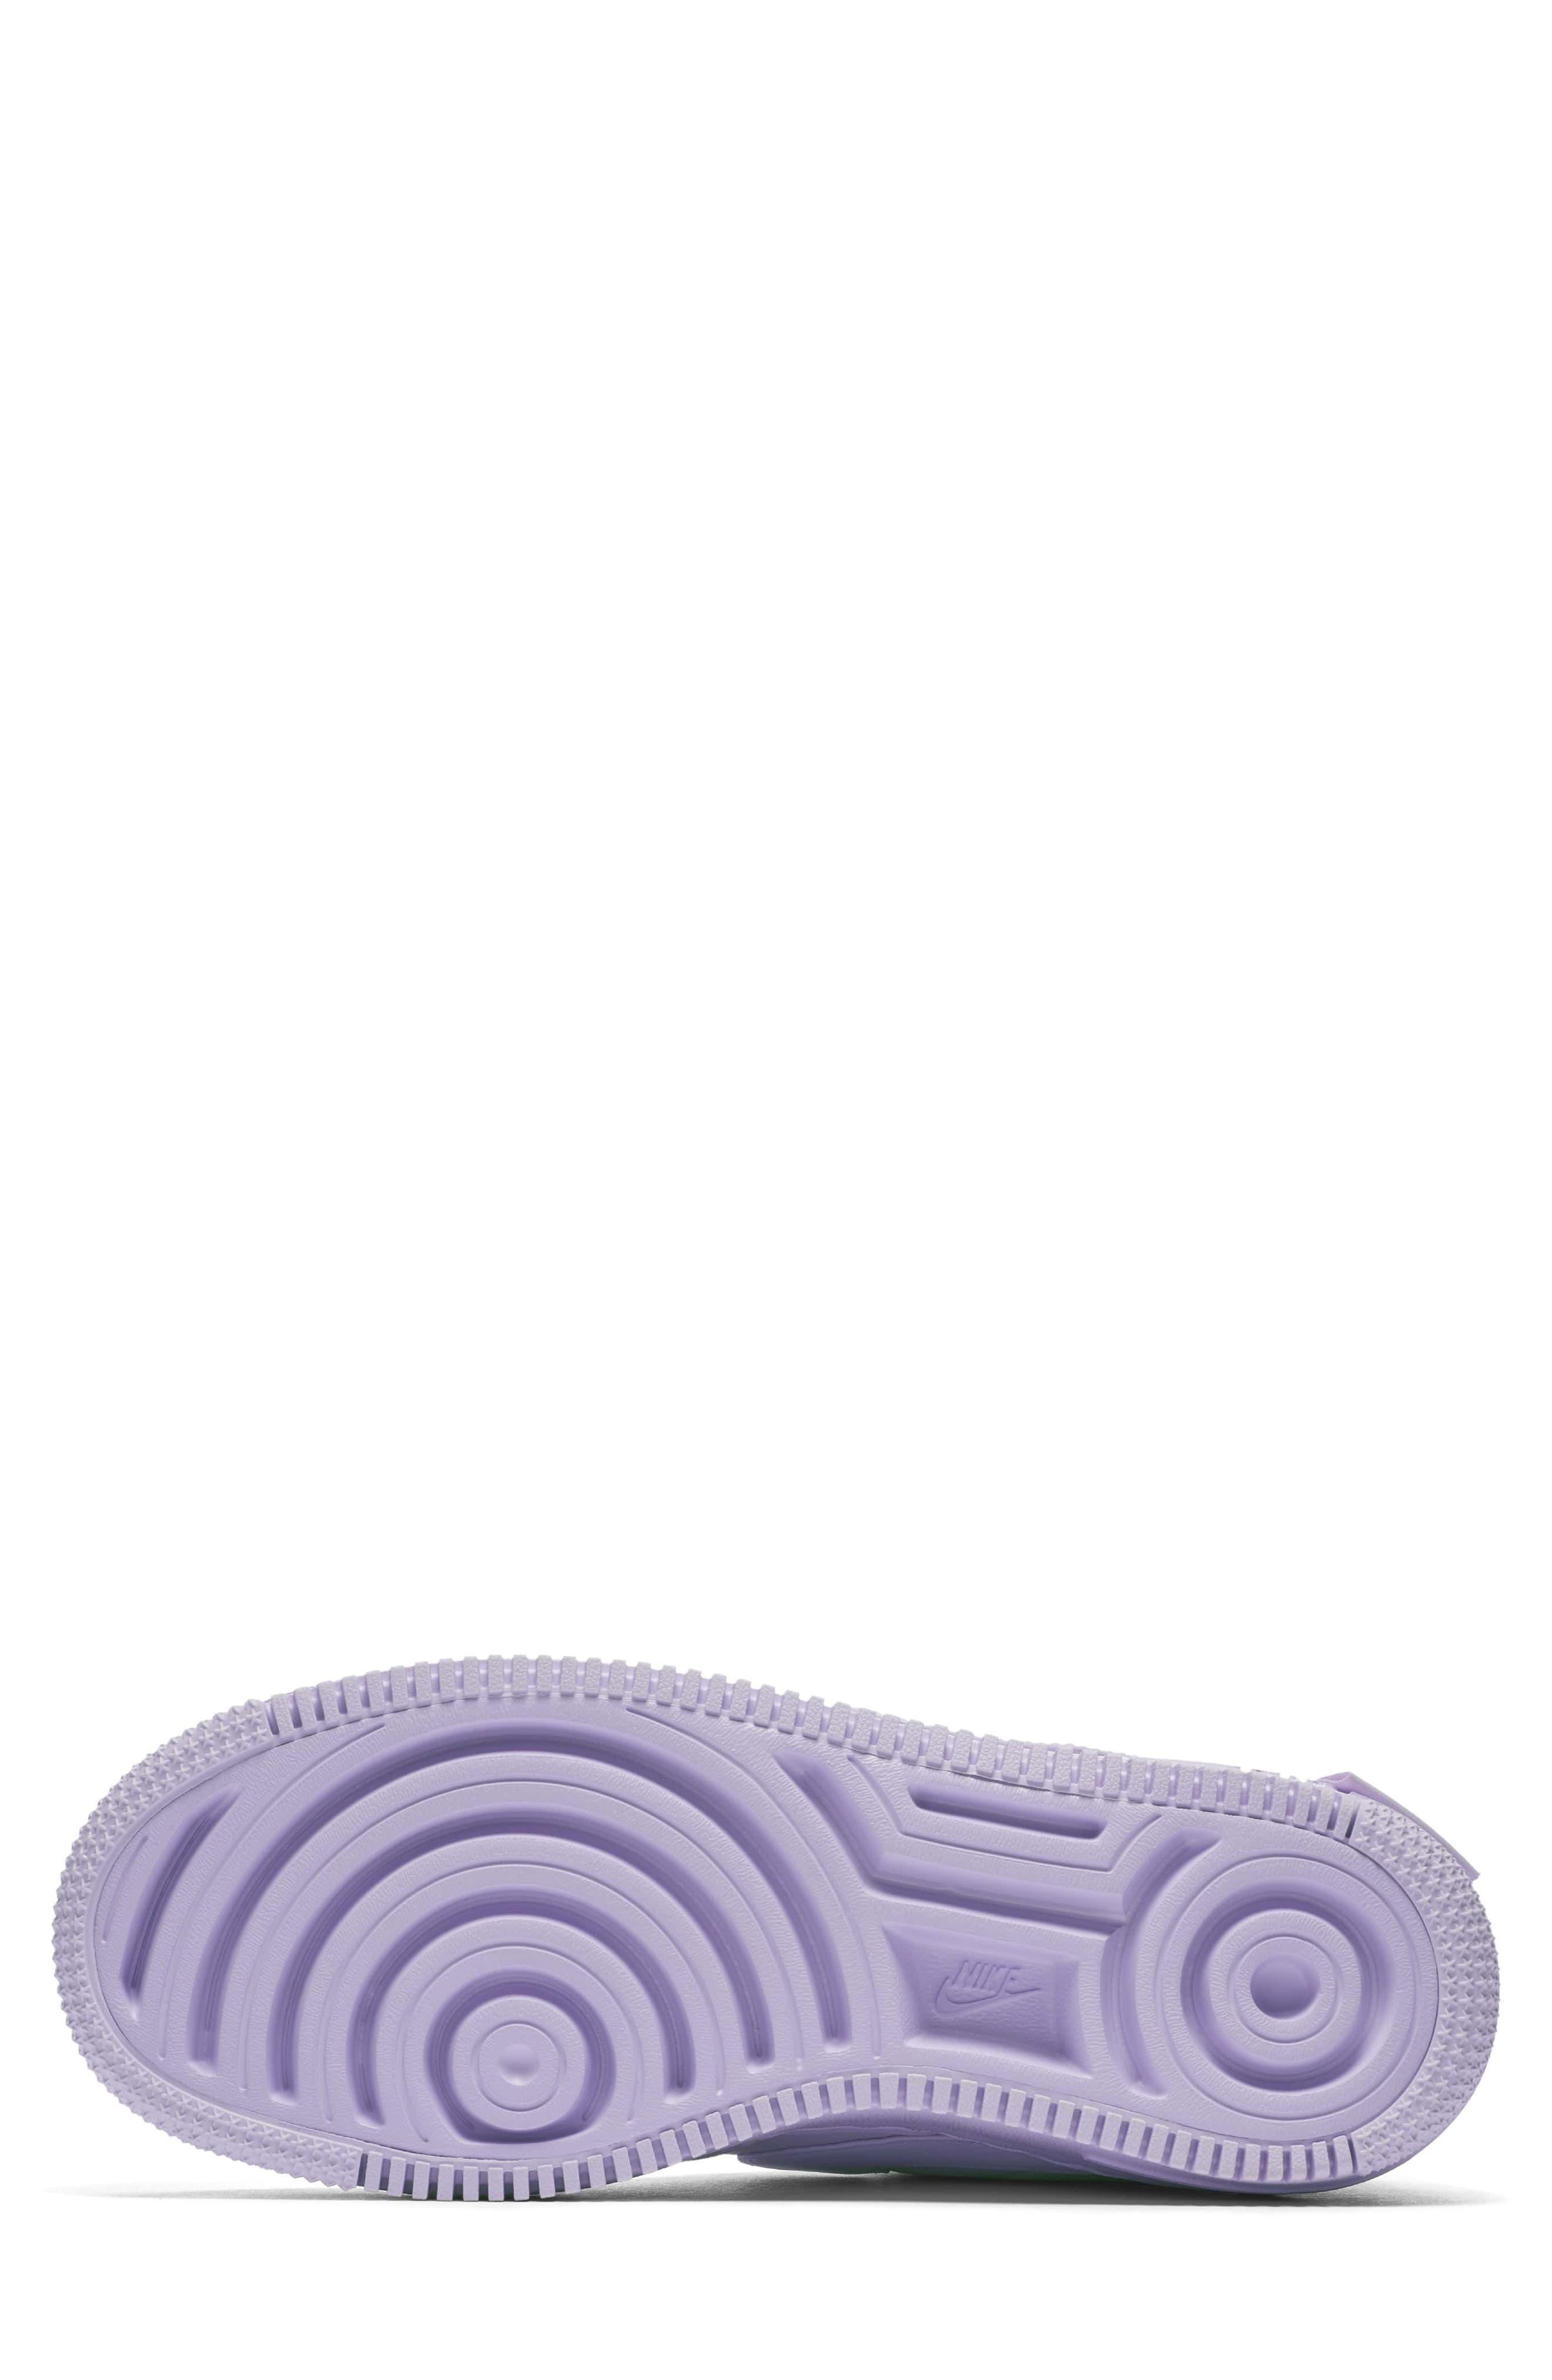 Air Force 1 Jester XX Sneaker,                             Alternate thumbnail 6, color,                             Violet Mist